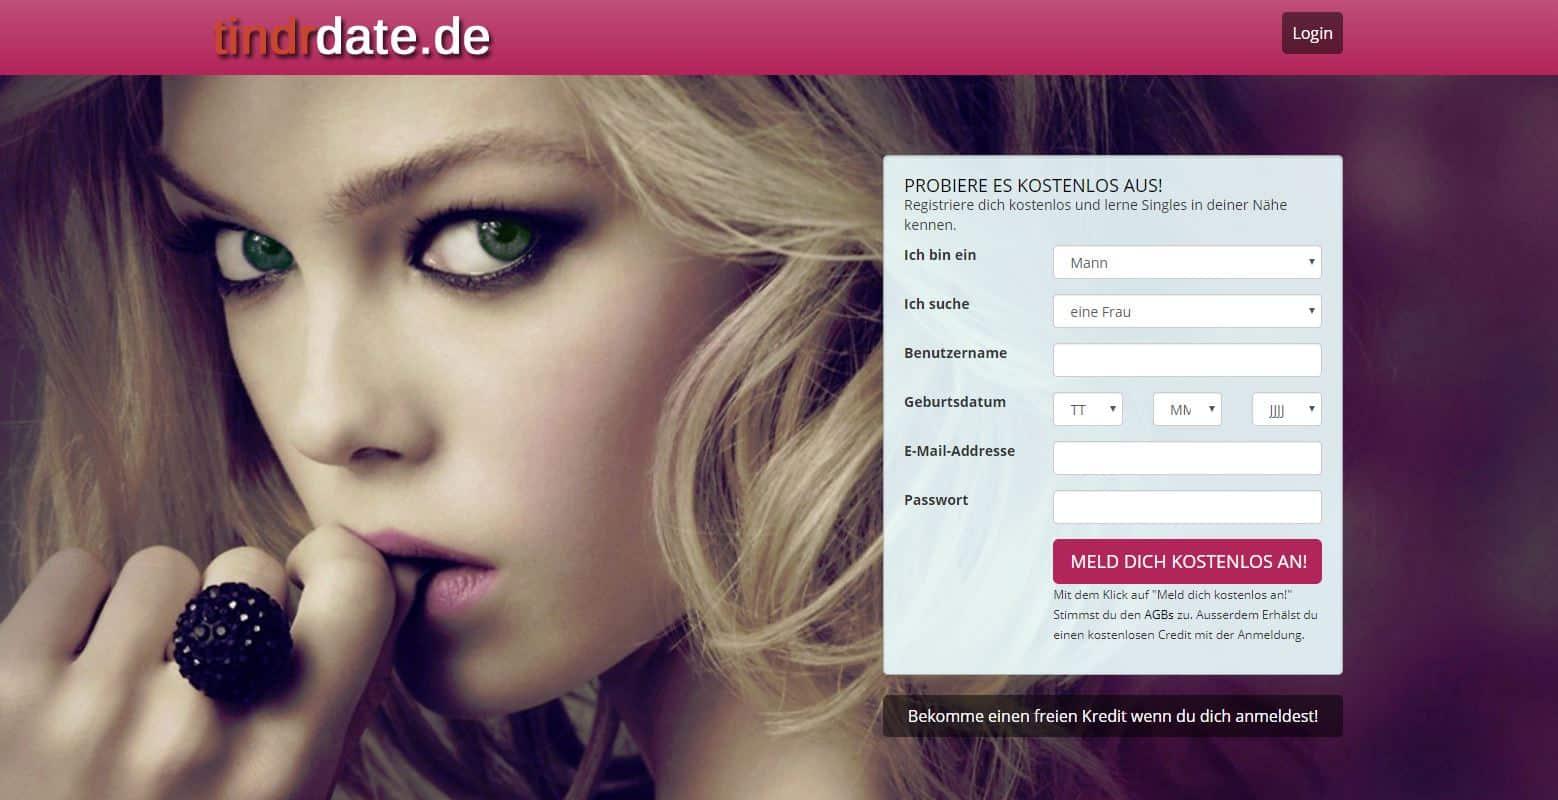 Testbericht: TindrDate.de Abzocke